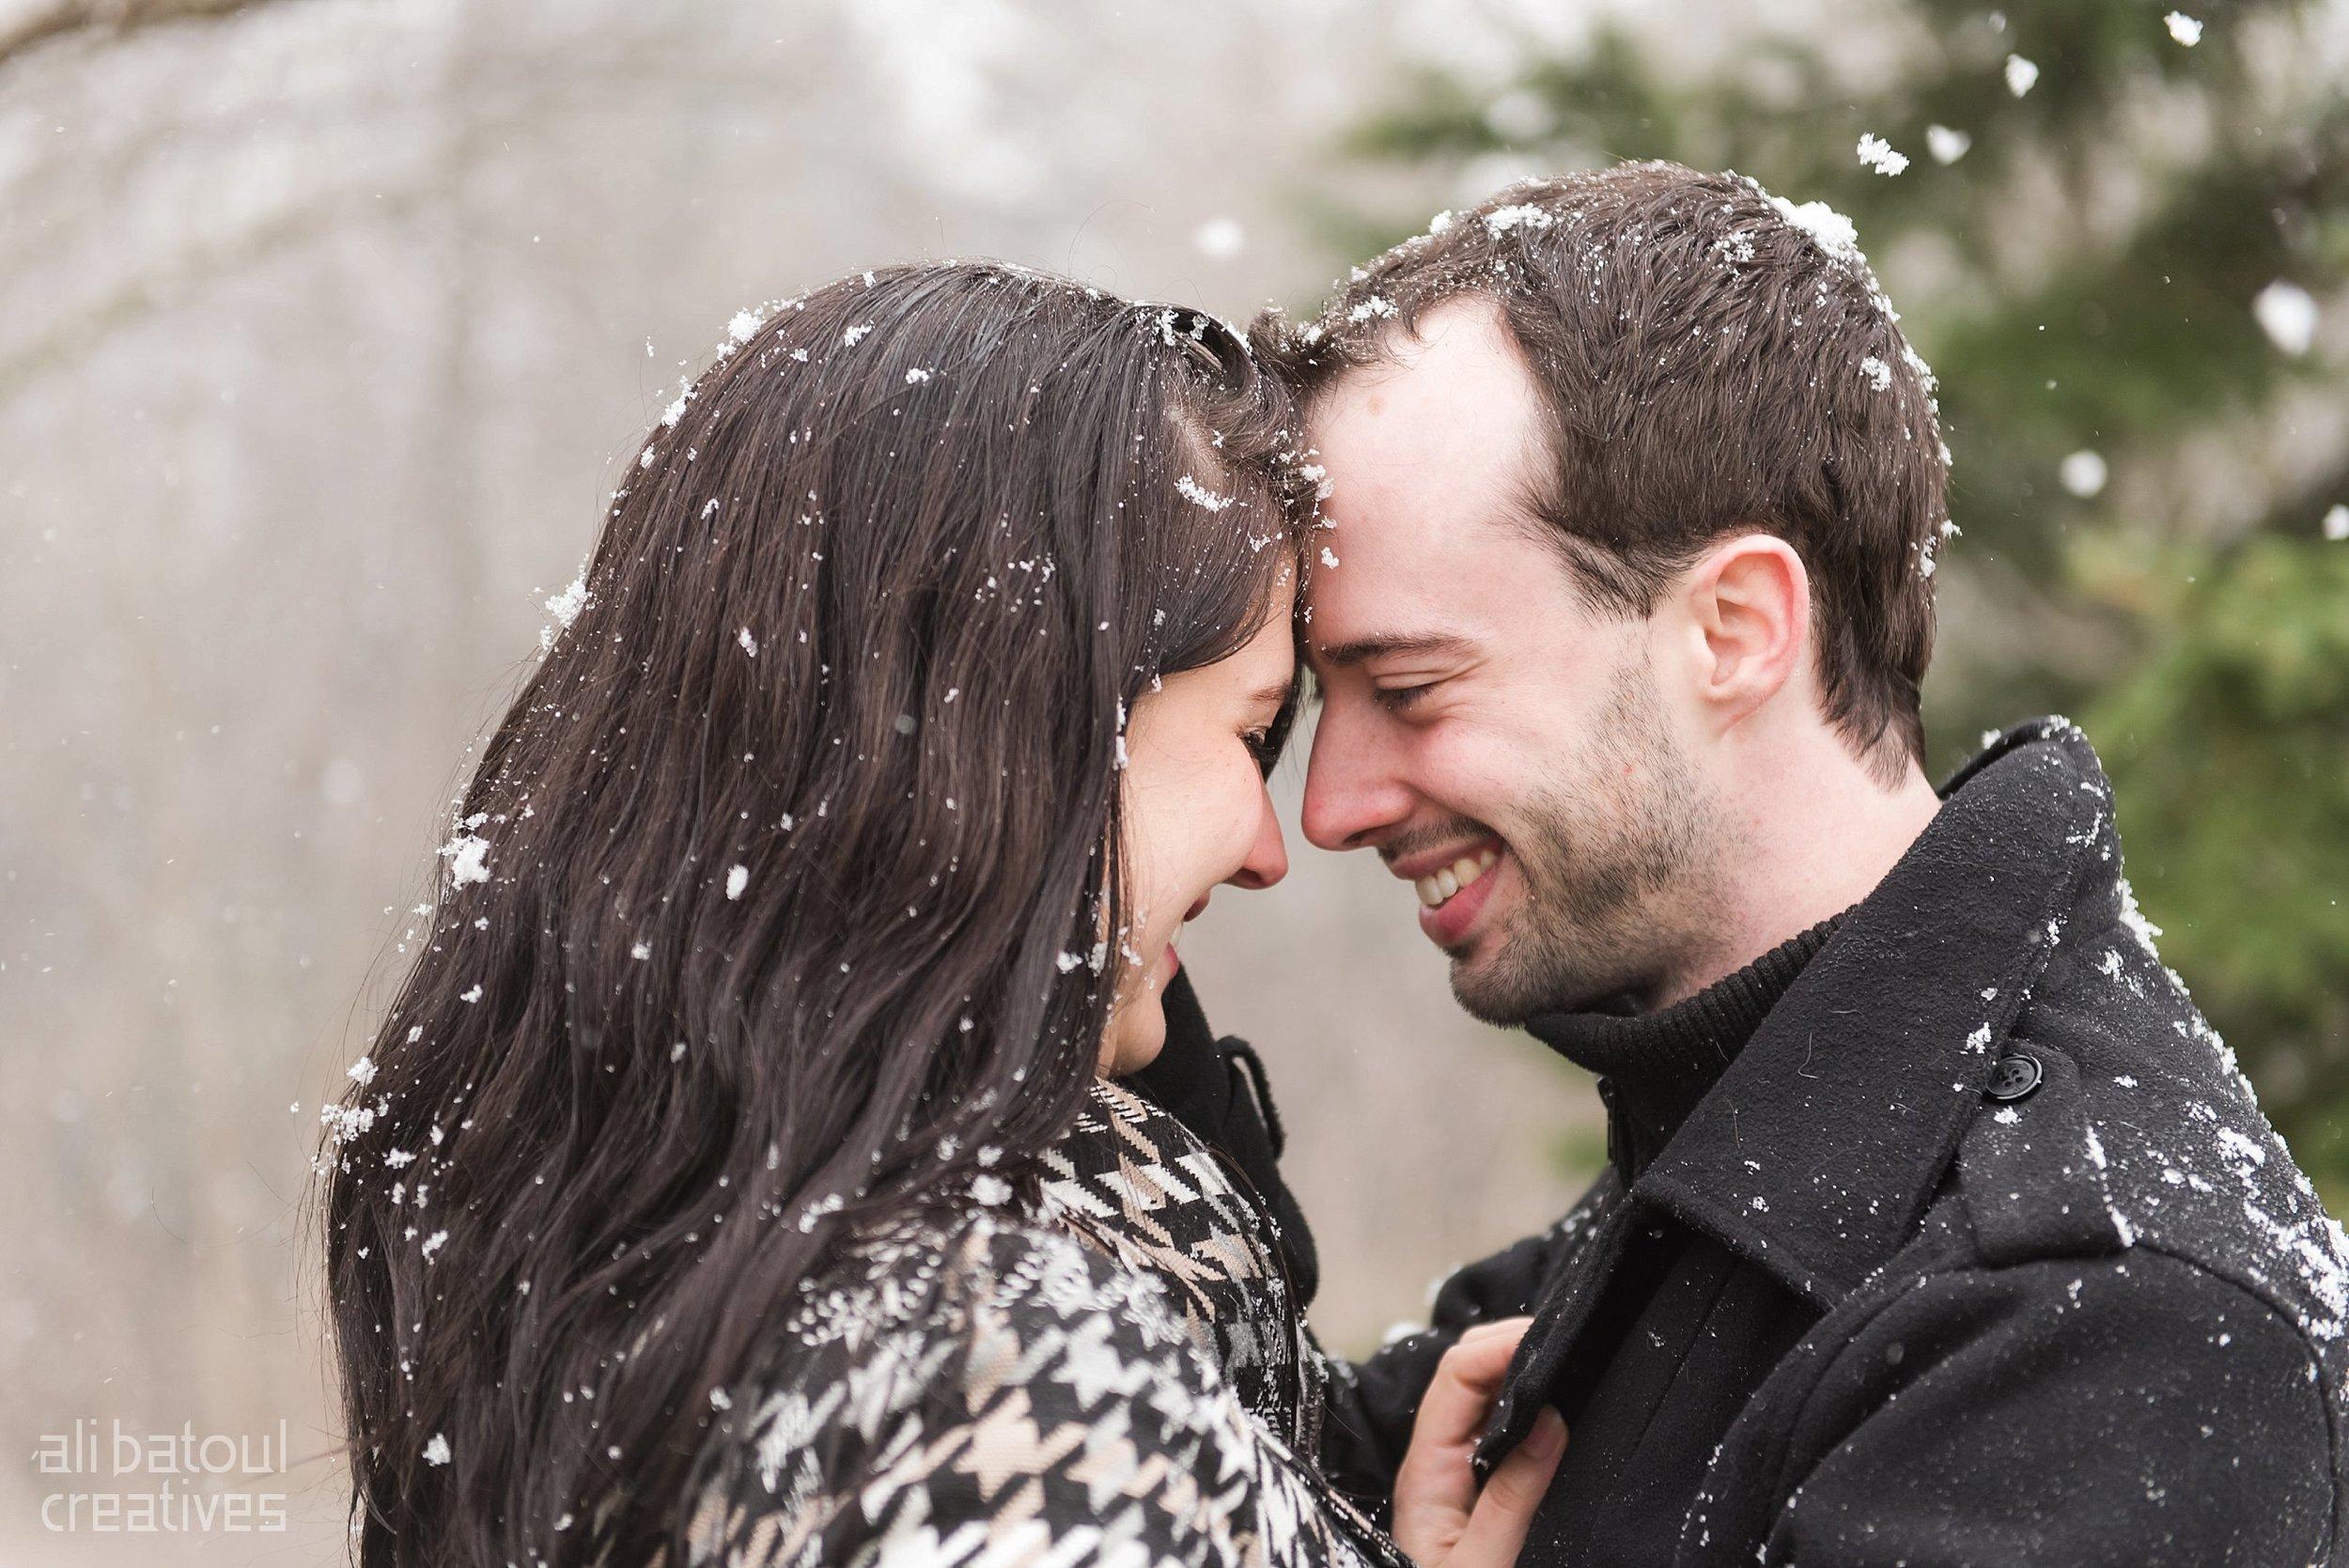 Ottawa Wedding Photography - Ali Batoul Creatives_0023.jpg